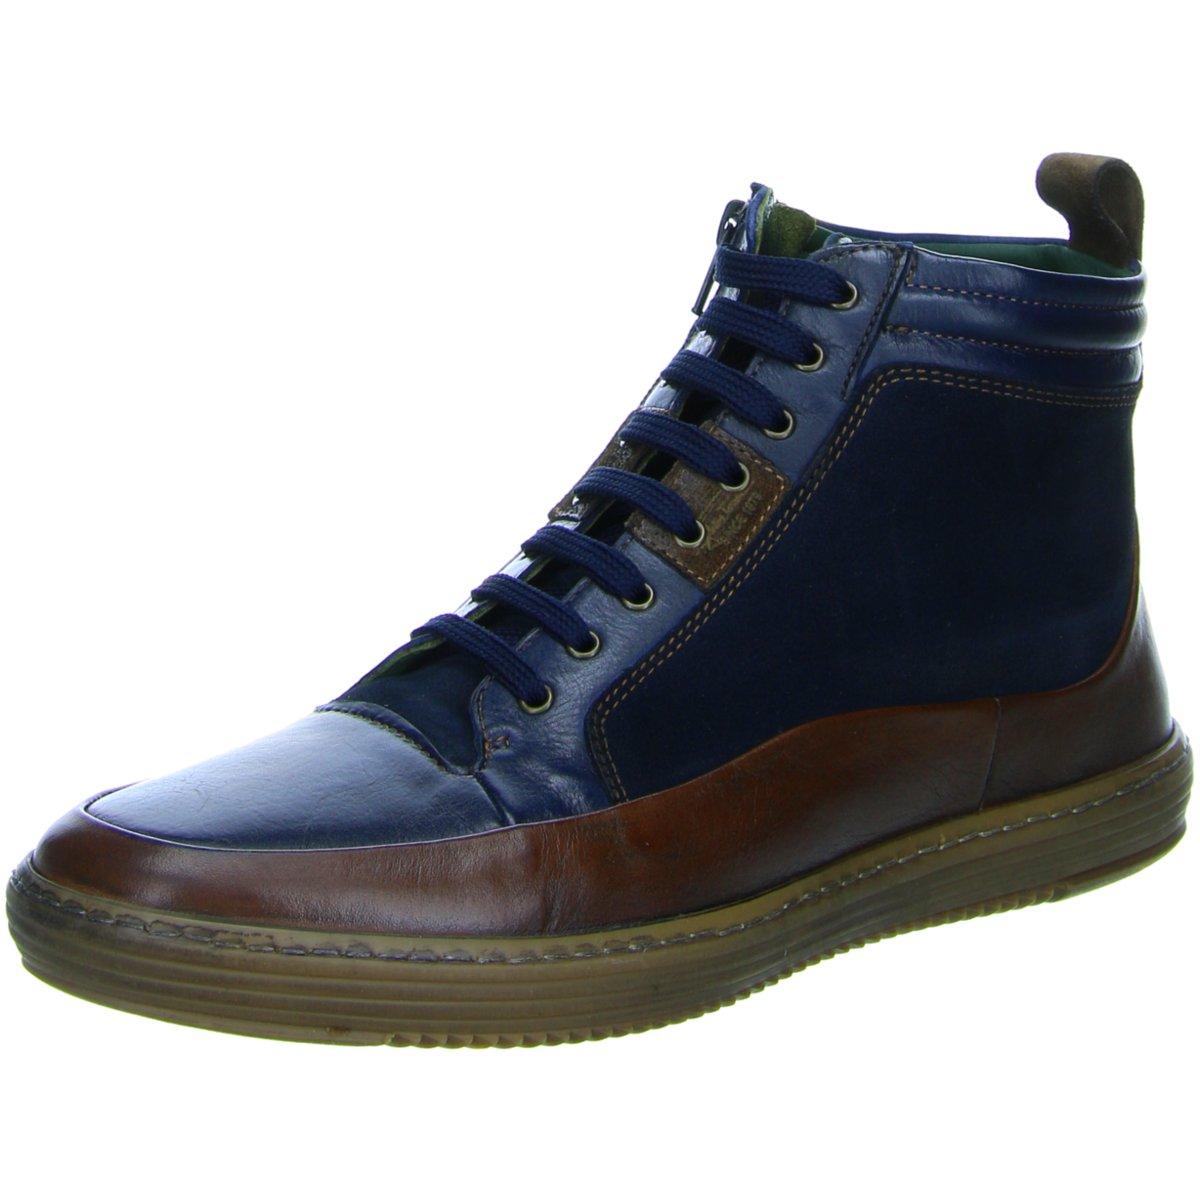 GALIZIO TORRESI Herren Stiefel 4204 420476A v.16600 blau 370568